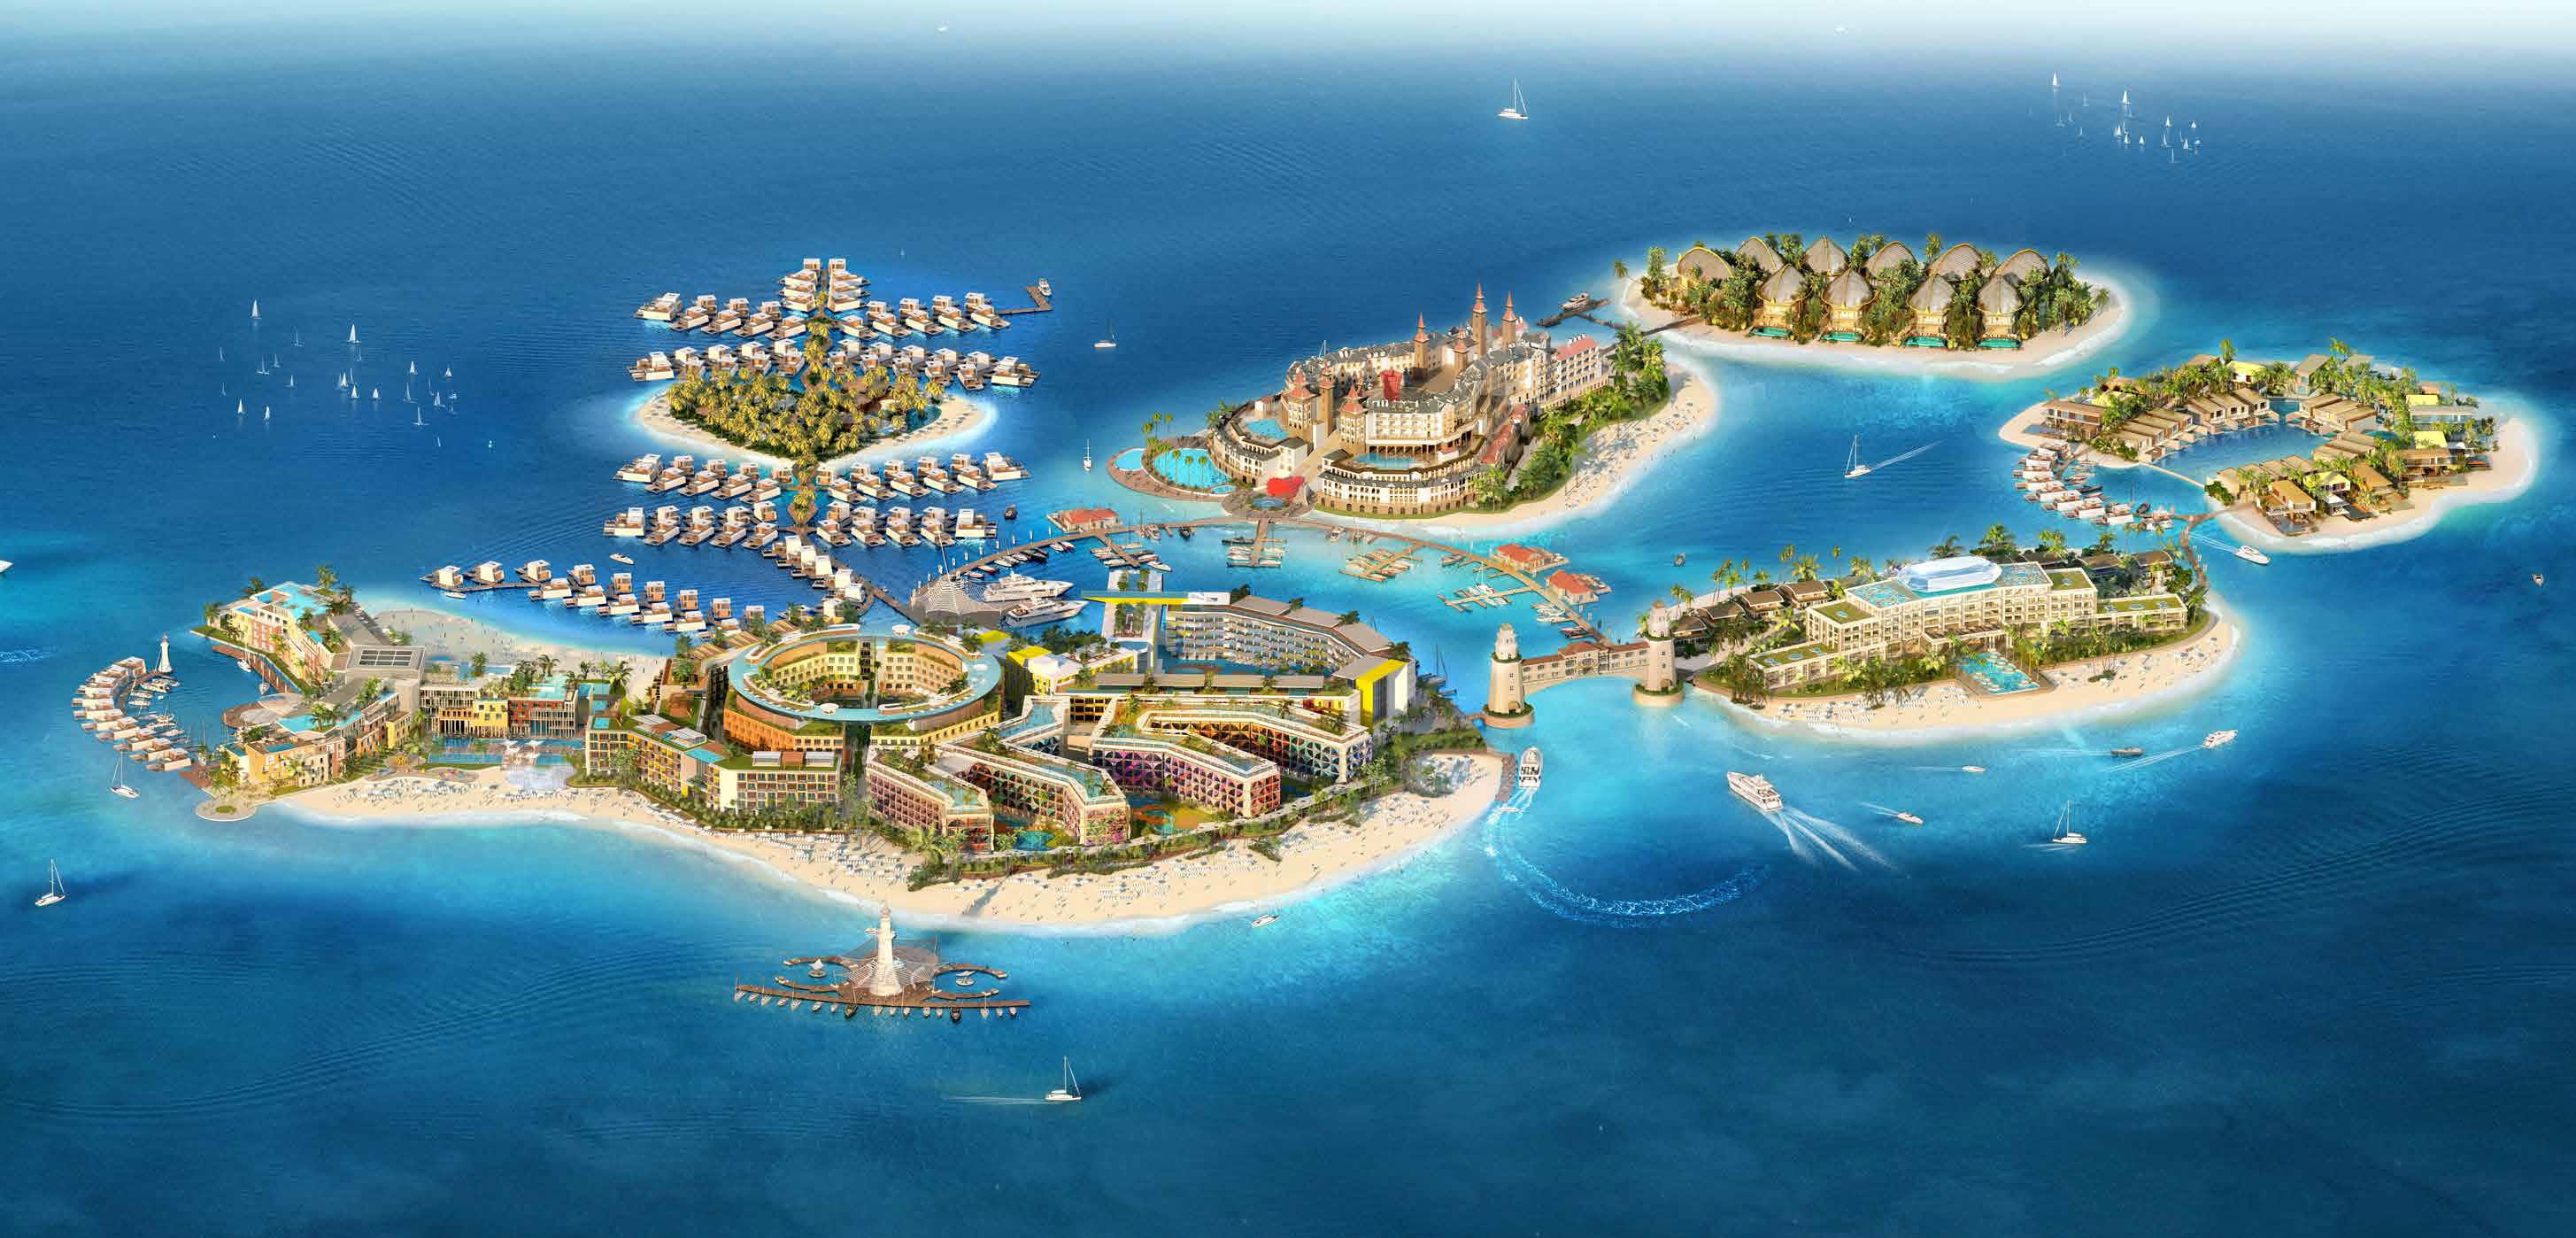 Cote-D-Azur-Hotel-Apartments Master Plan